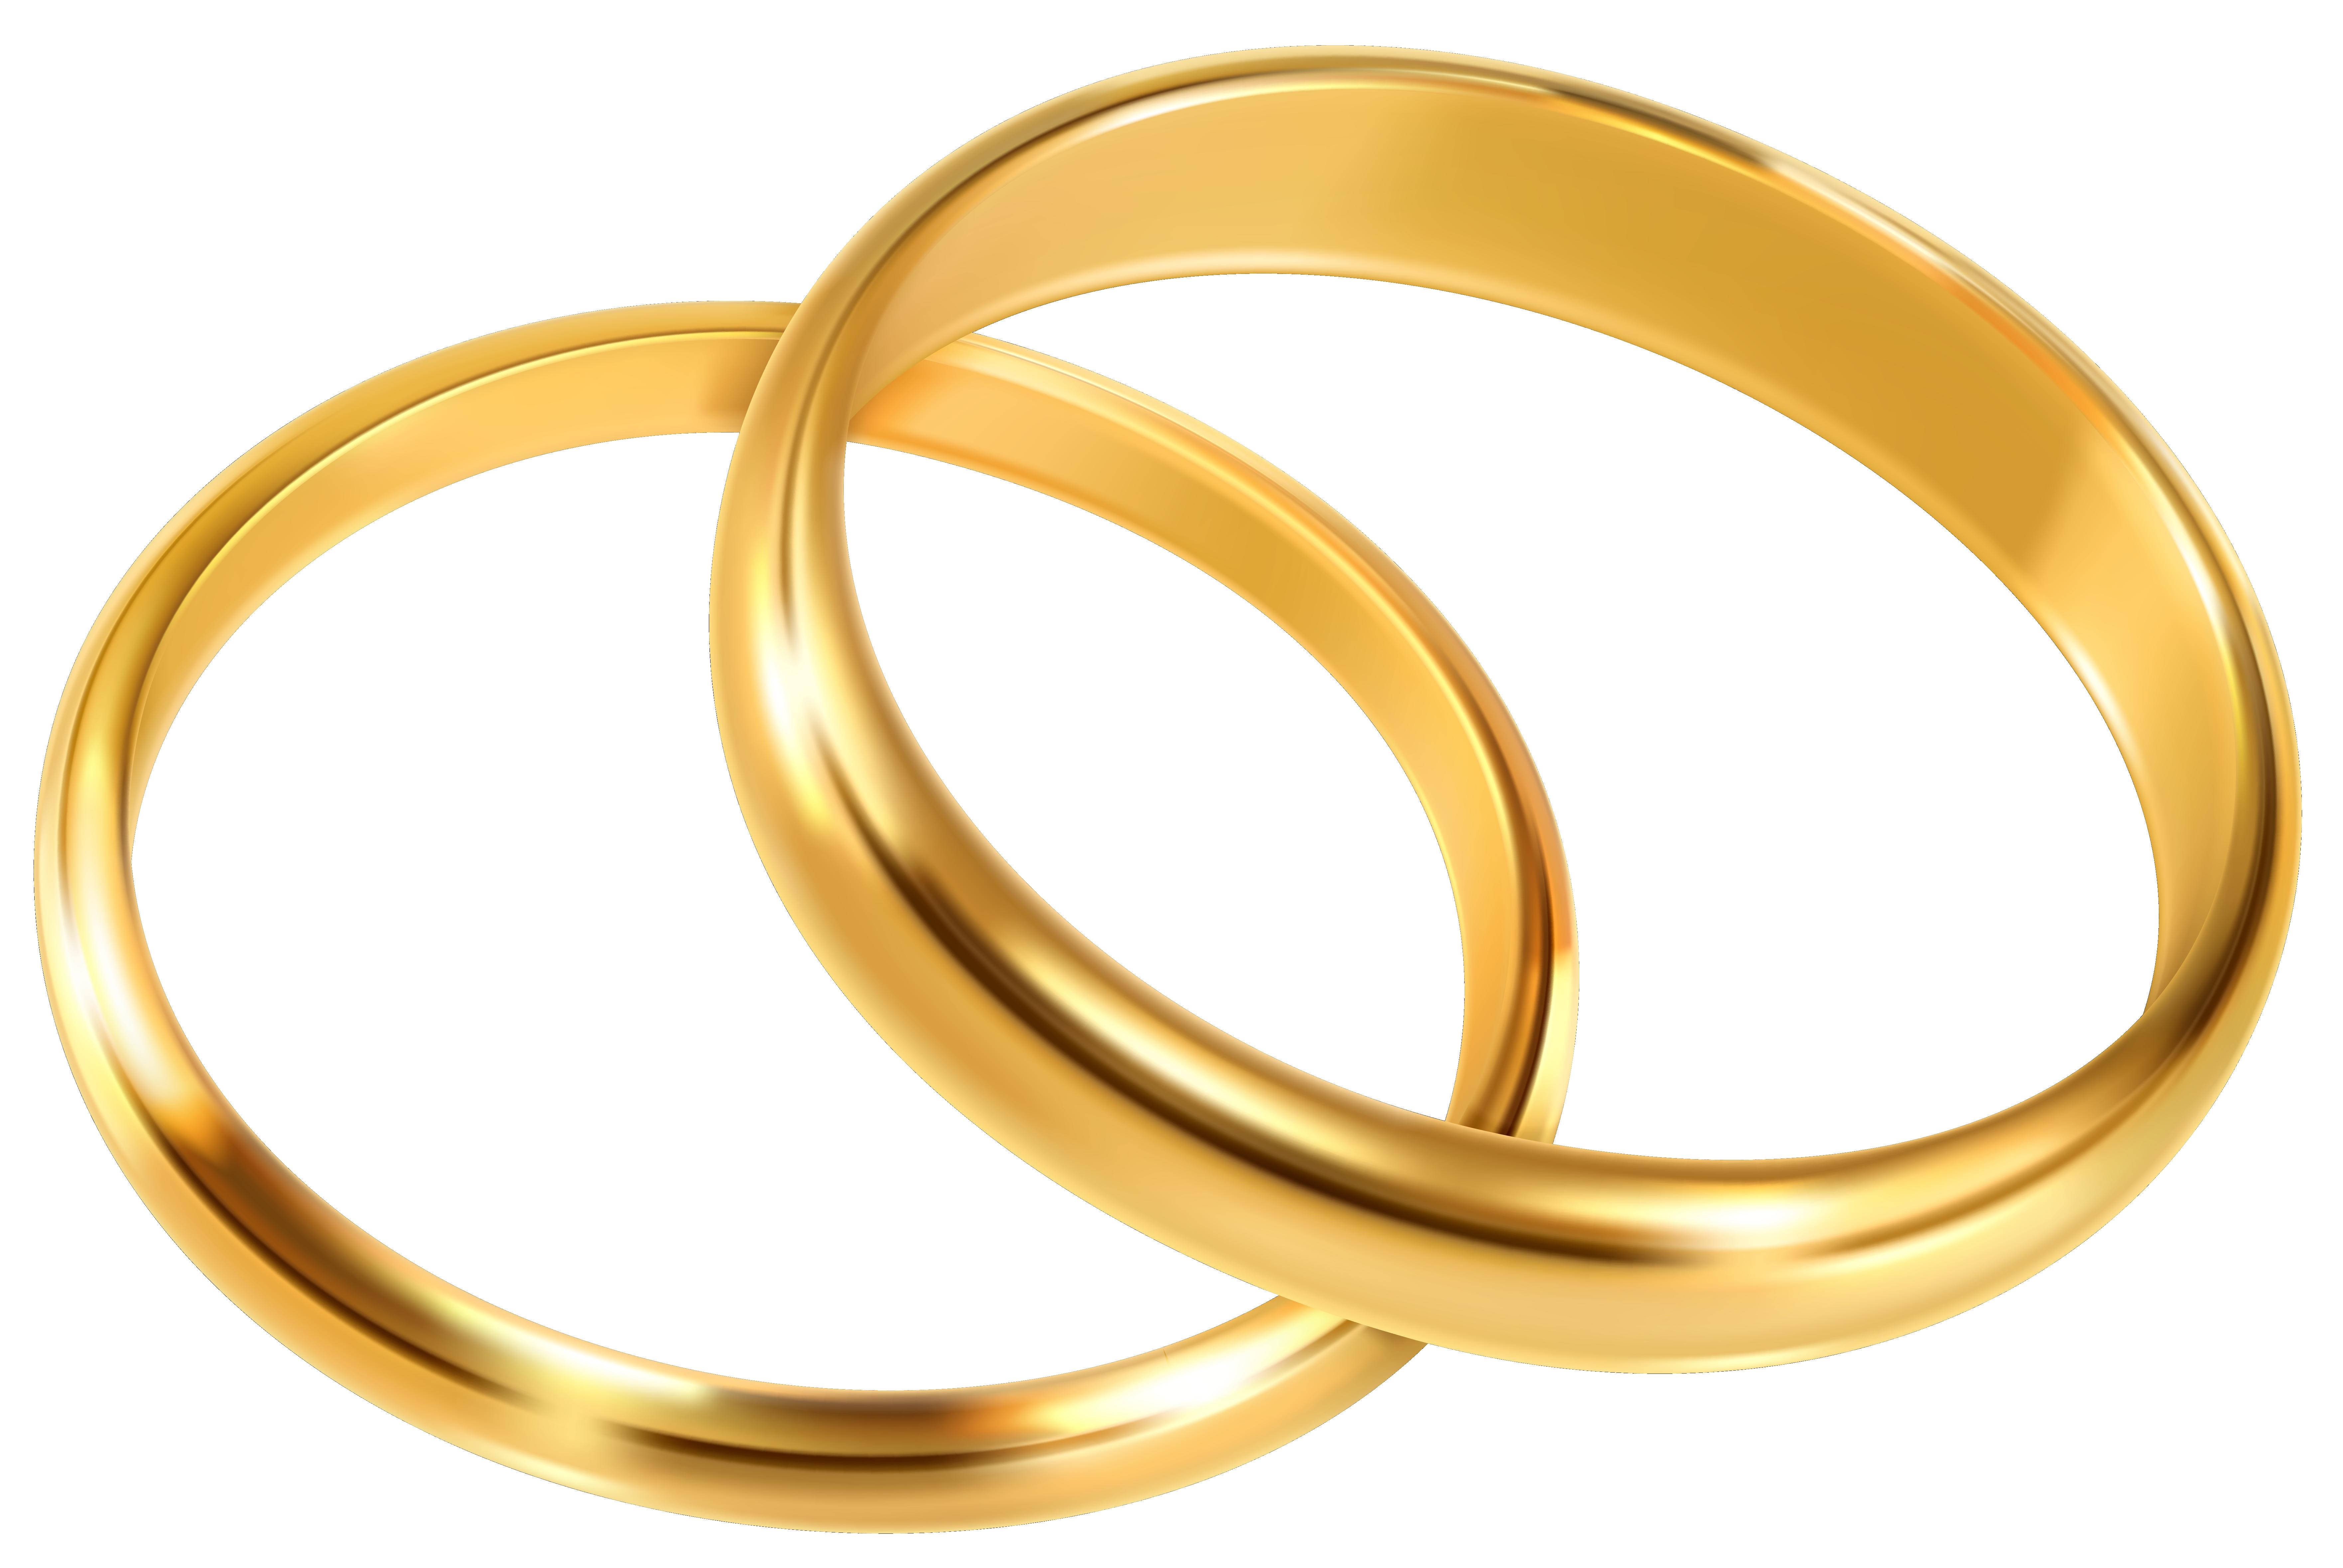 7047x4717 Beautiful Wedding Rings Silhouette Wedding